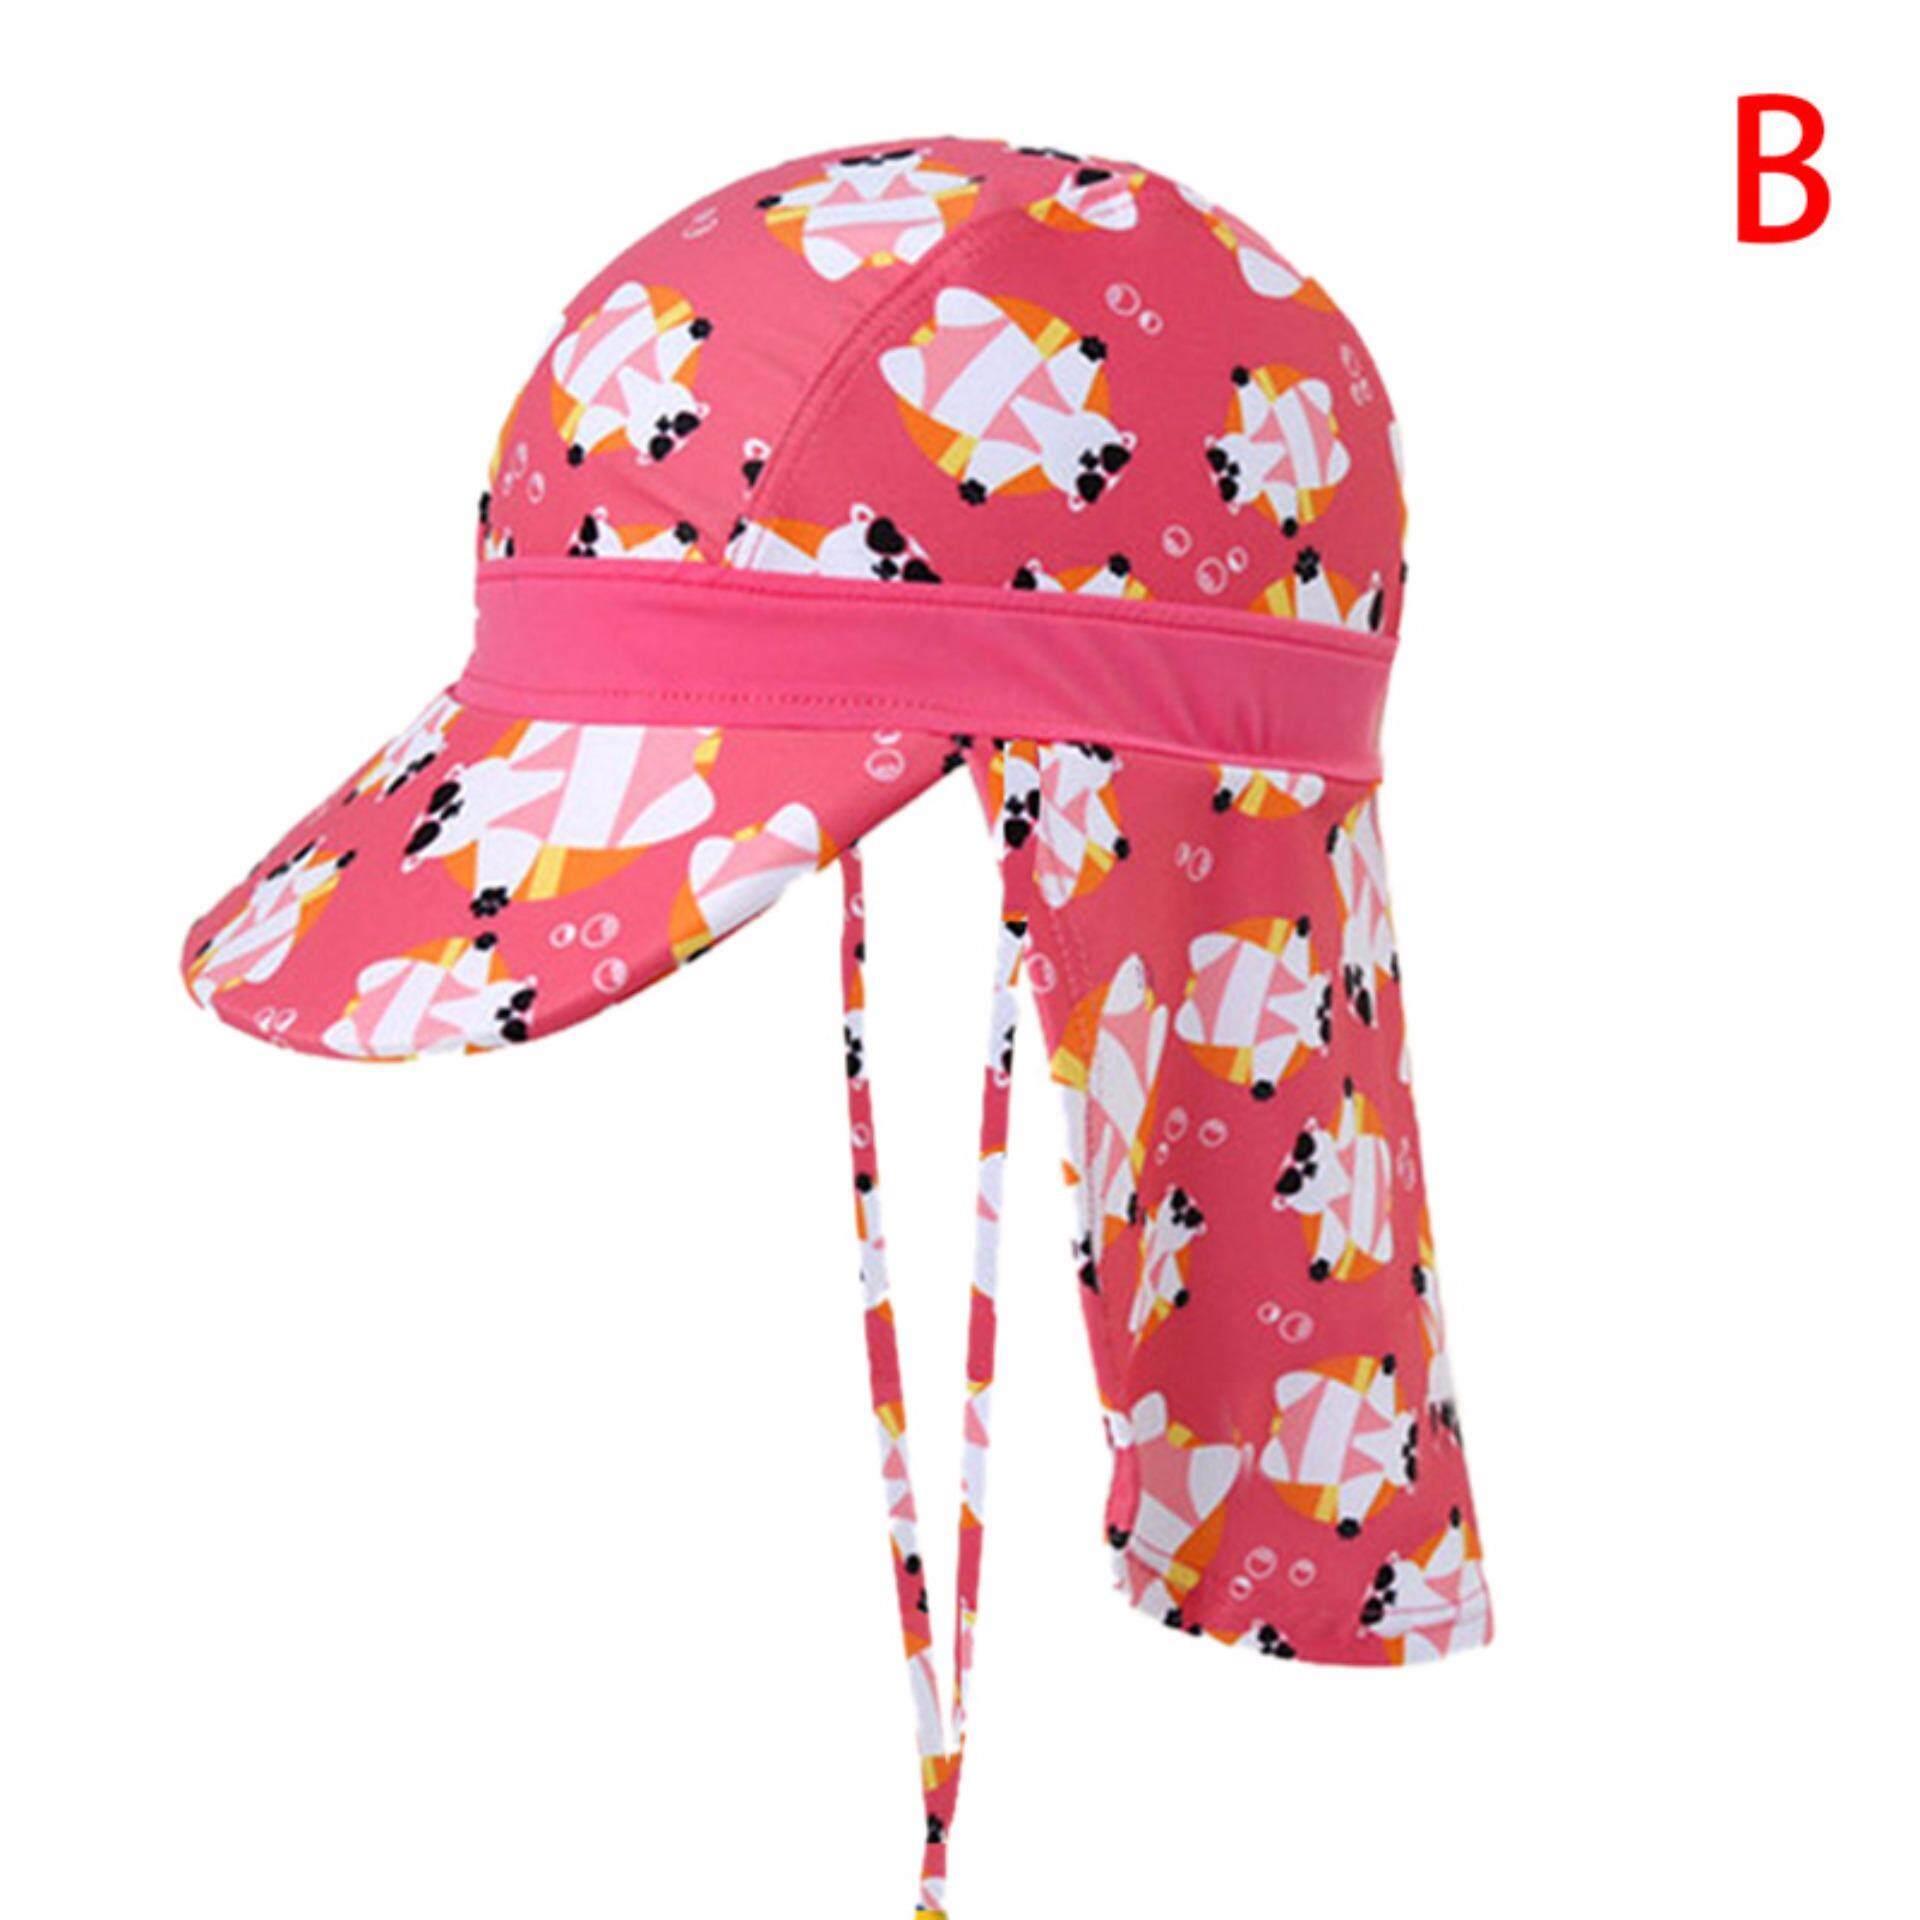 1c323232f Kid Boy Girl Swim Caps Baby Sun Safe Sporty Flap Swim Uv+50 Flap Hat Pool A  Gorgeous Road